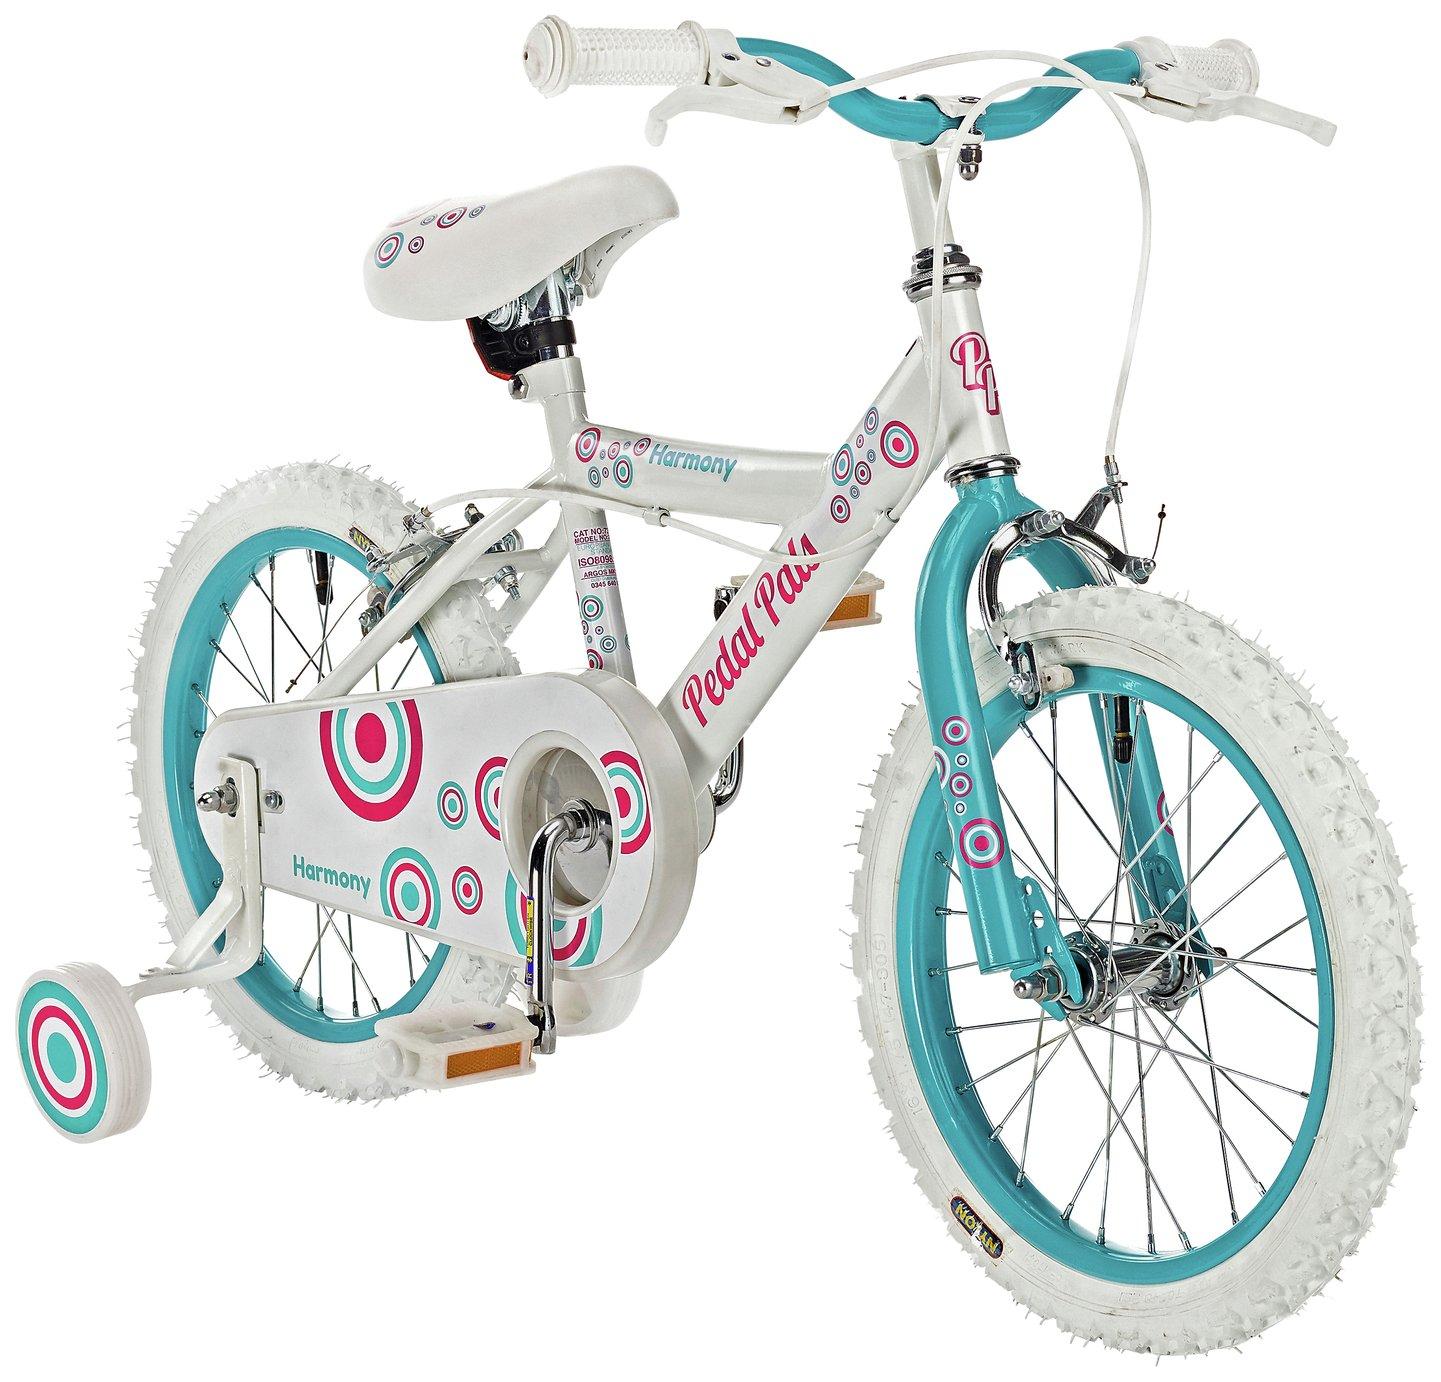 Pedal Pals 16 Inch Harmony Kids Bike